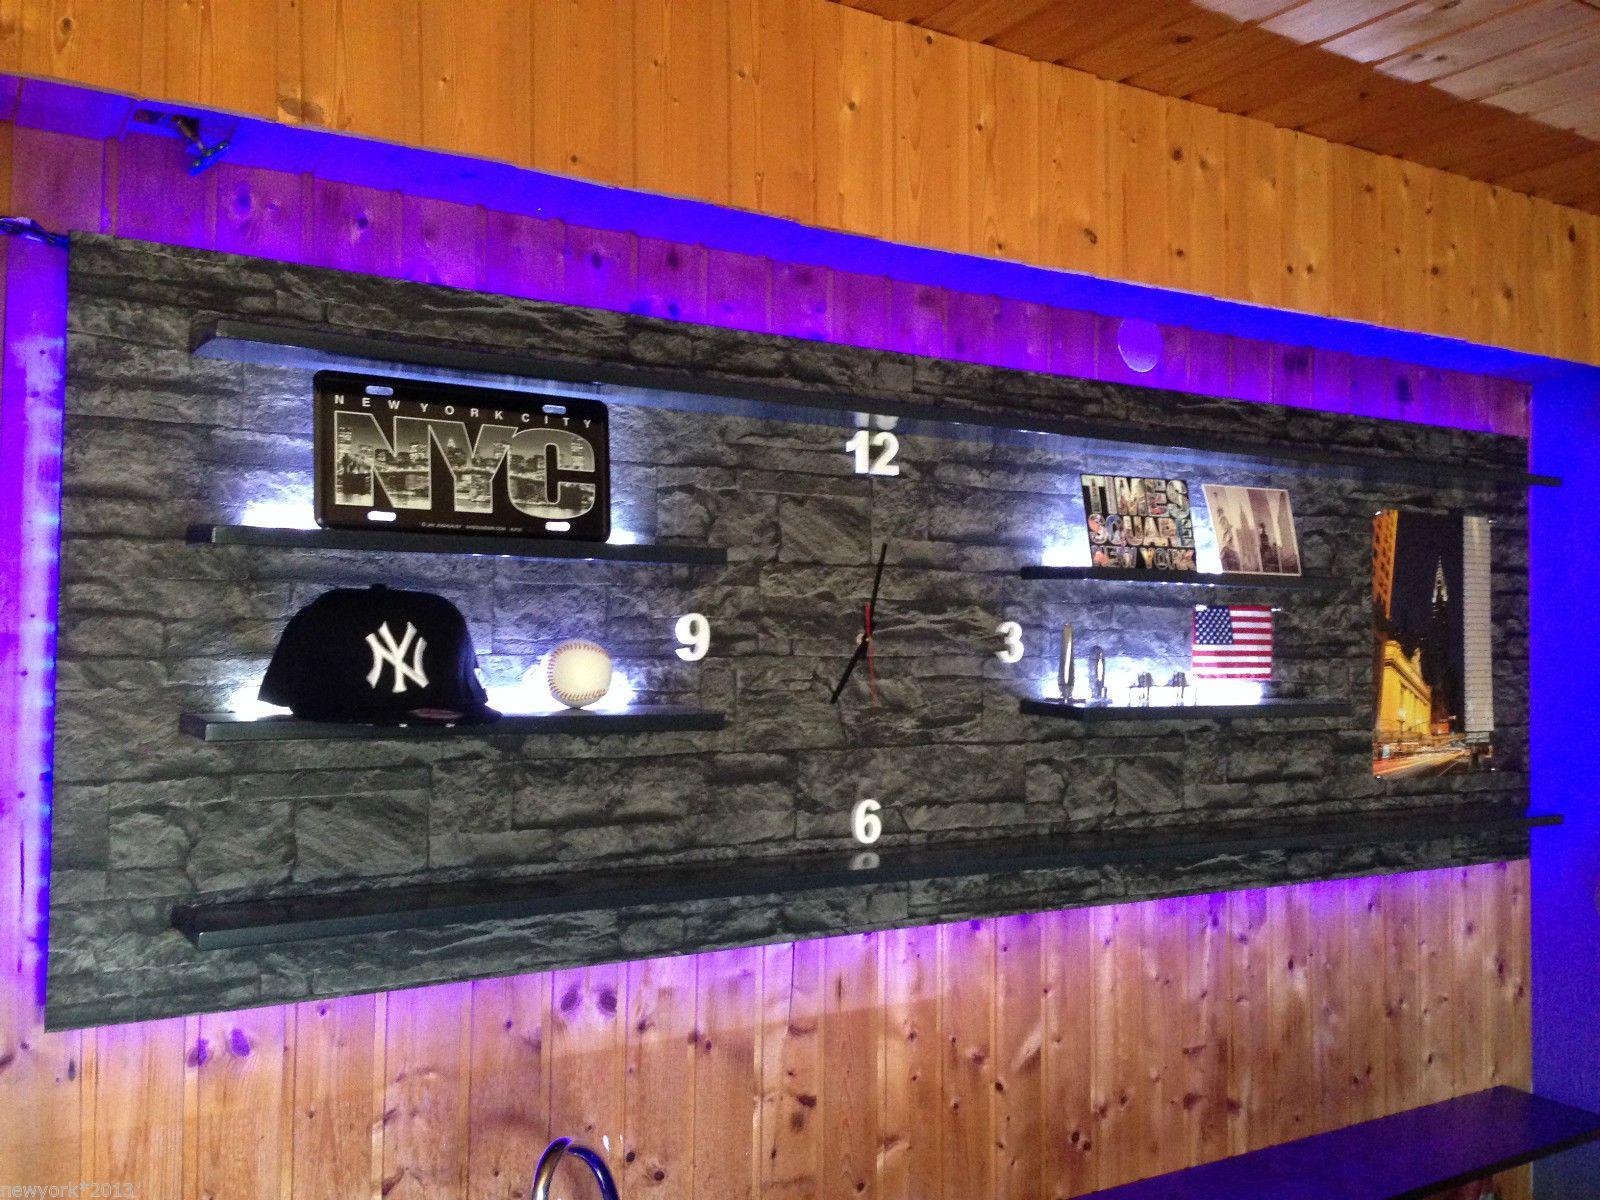 wandboard bar lounge theke partyraum led beleuchtet l nge x breite x dicke 220cm x 70cm x. Black Bedroom Furniture Sets. Home Design Ideas